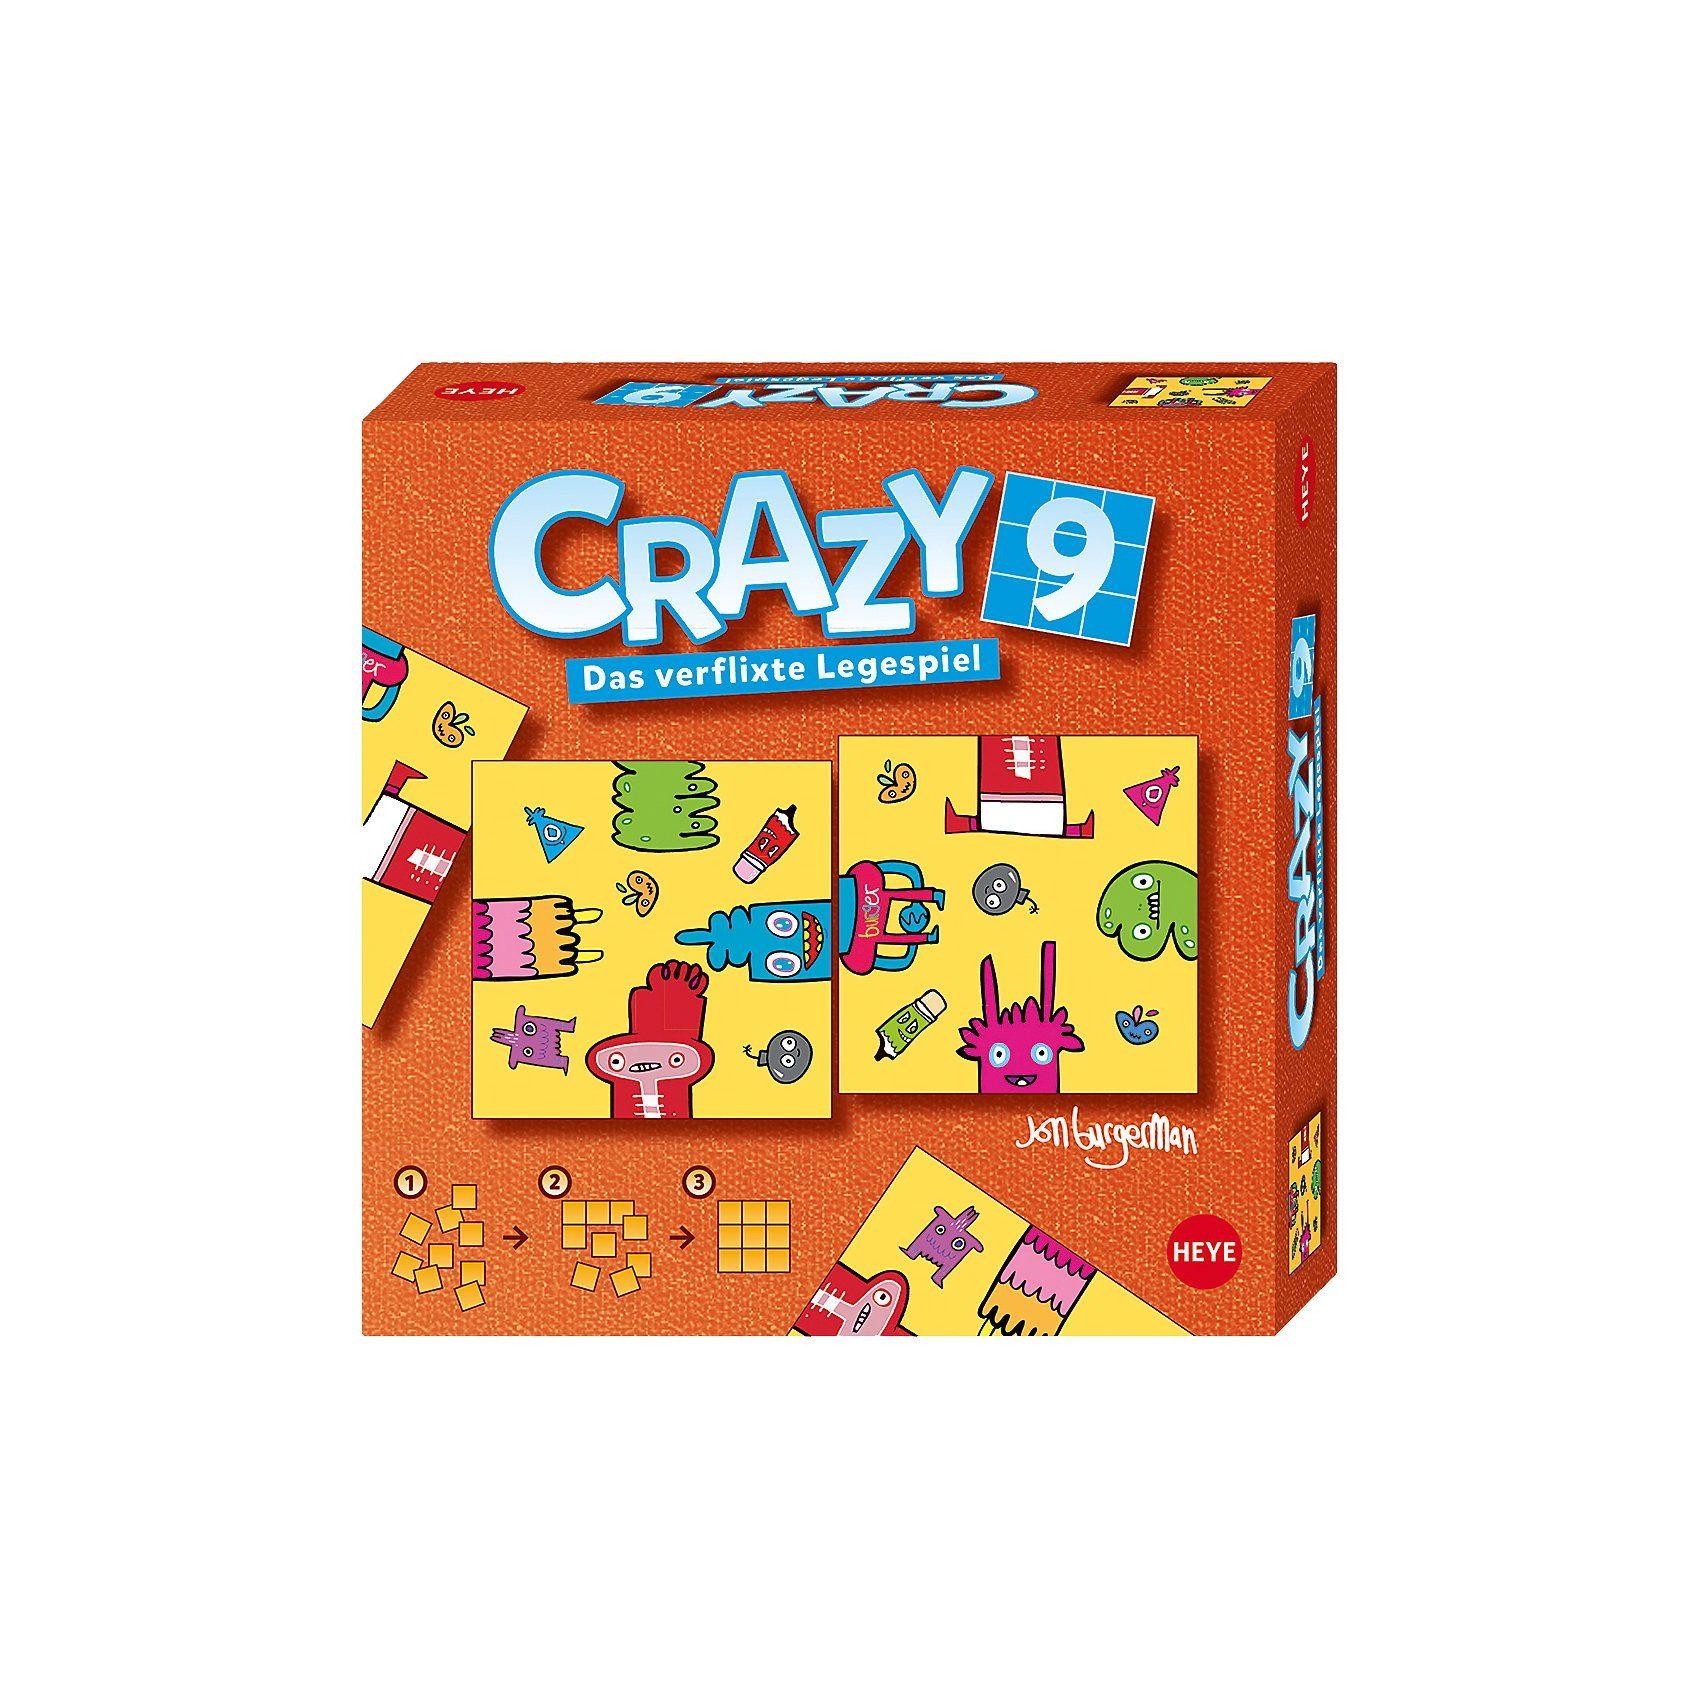 HEYE Crazy9 - Burgerman Doodles